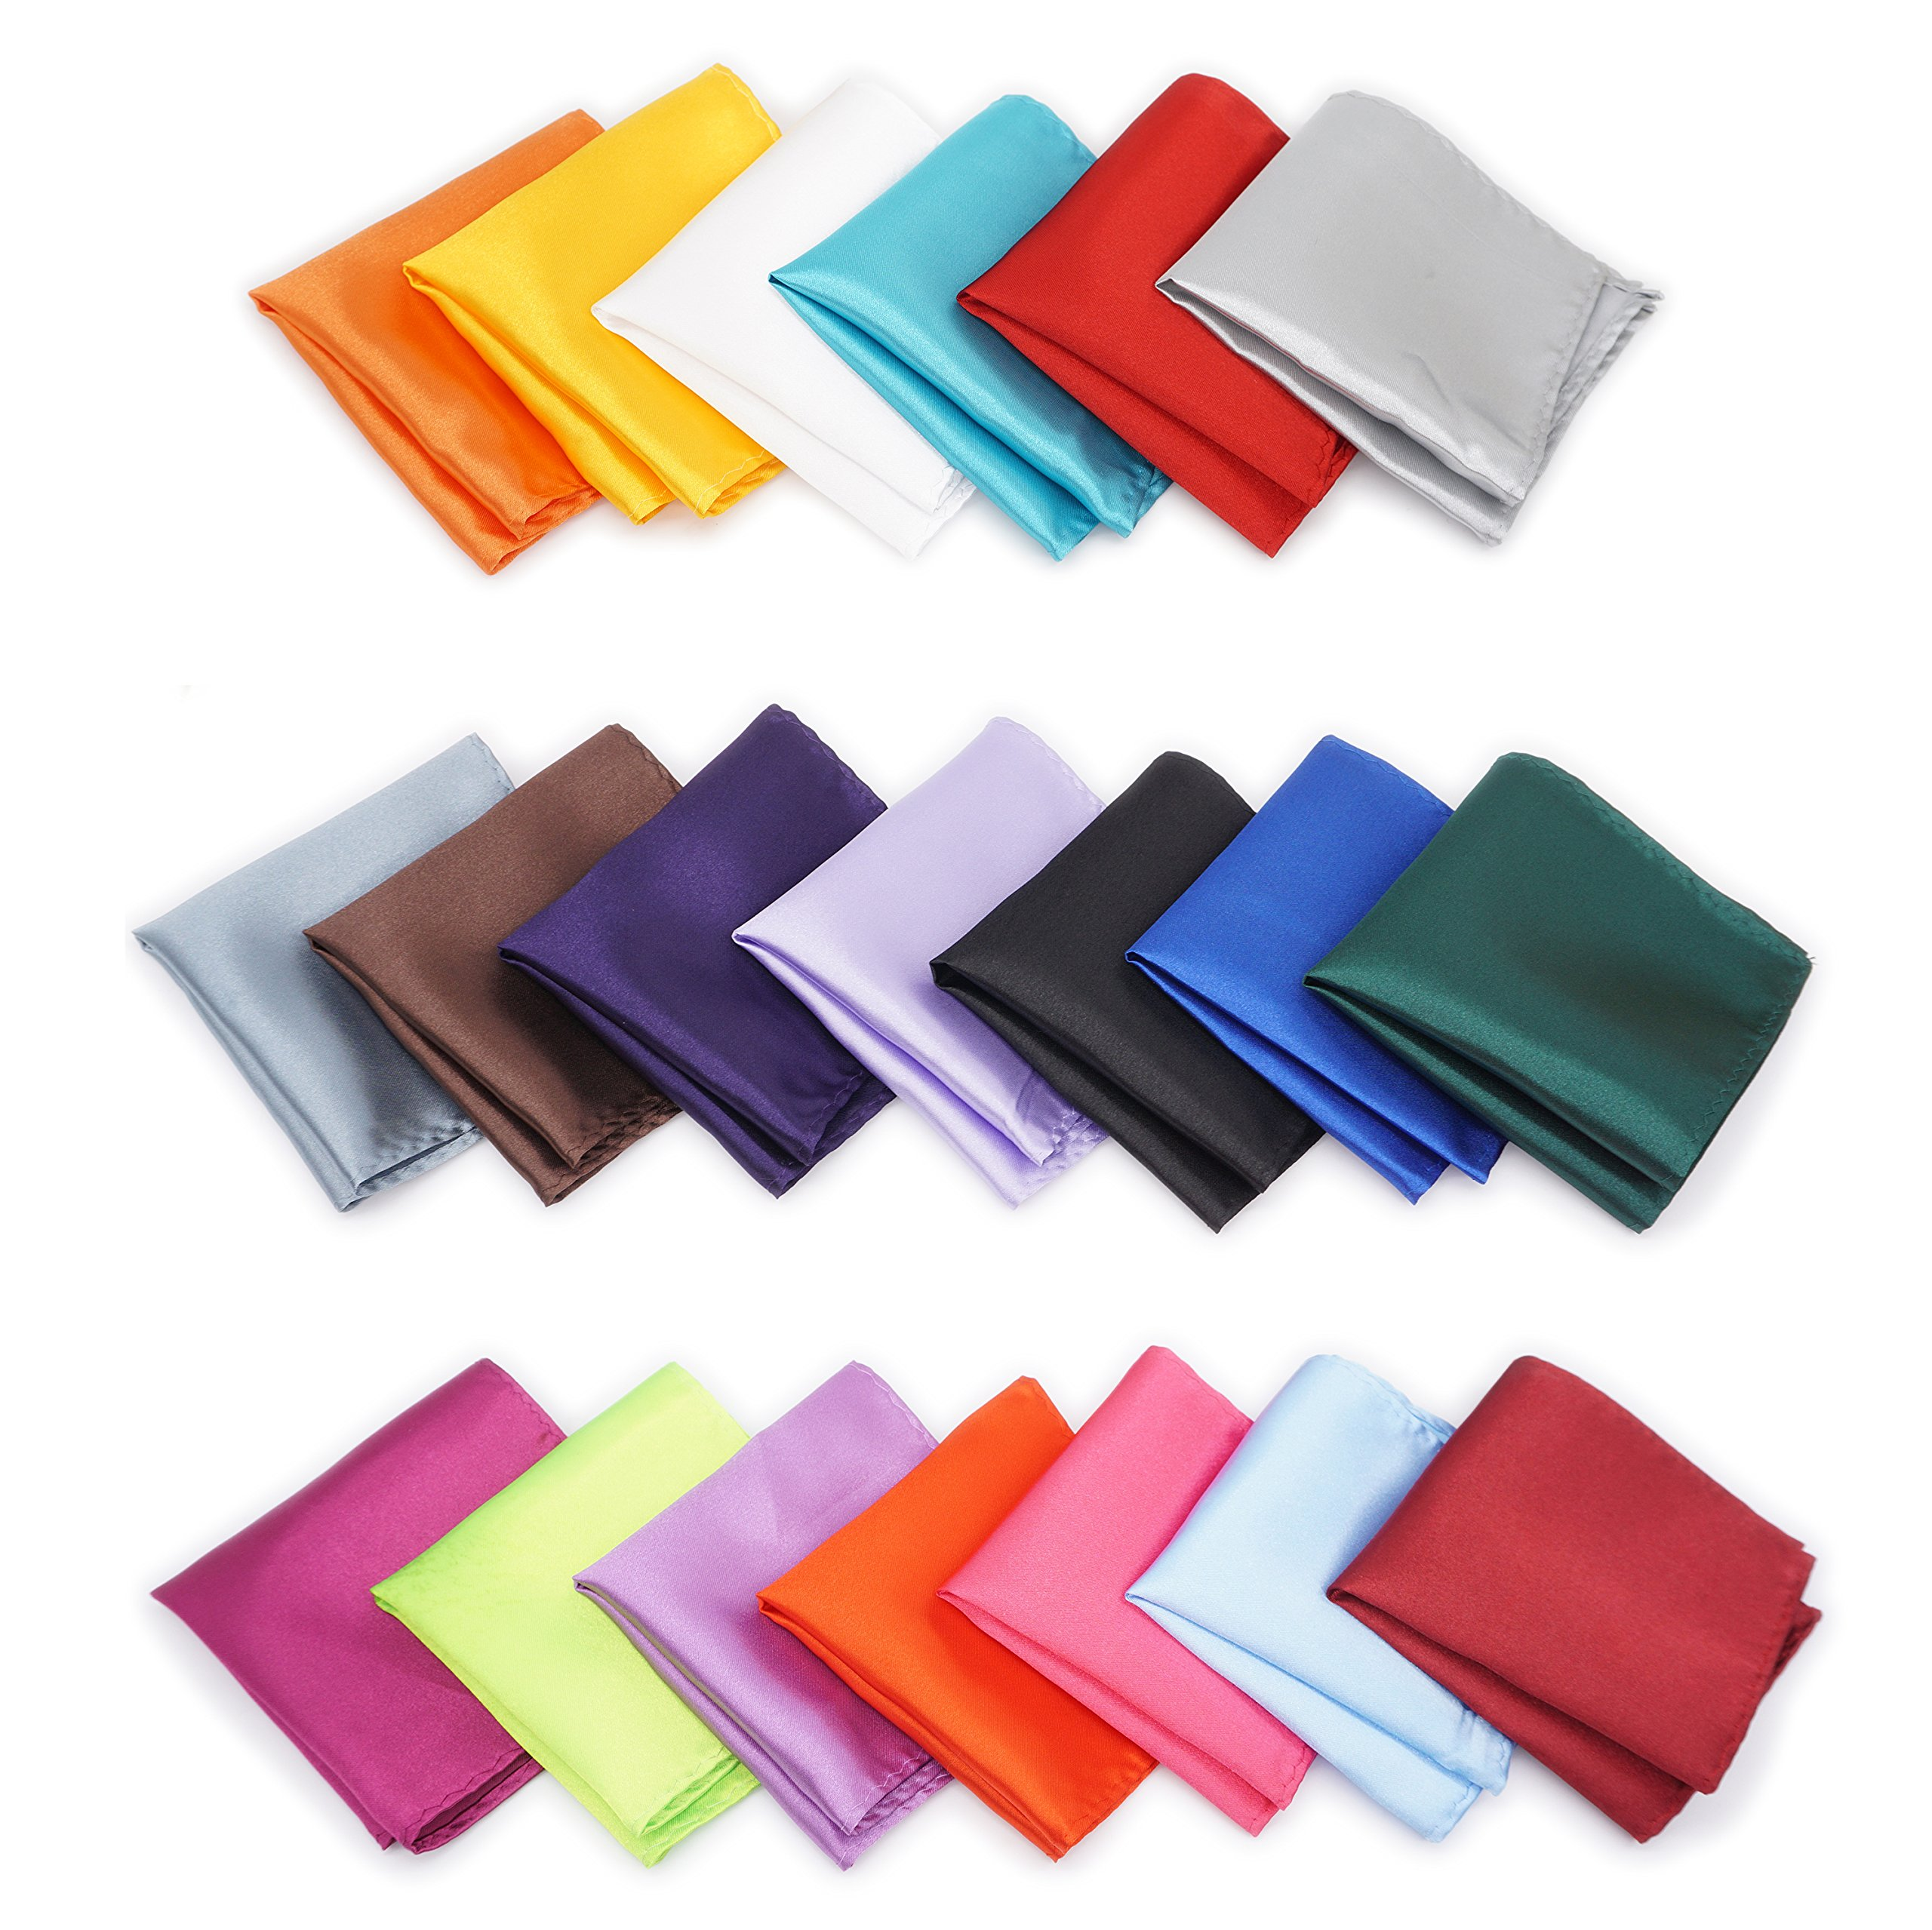 AVANTMEN 20 PCS Men's Pocket Squares Assorted Solid Color Handkerchief Hanky with Gift Box (8.6 x 8.6'', S11)